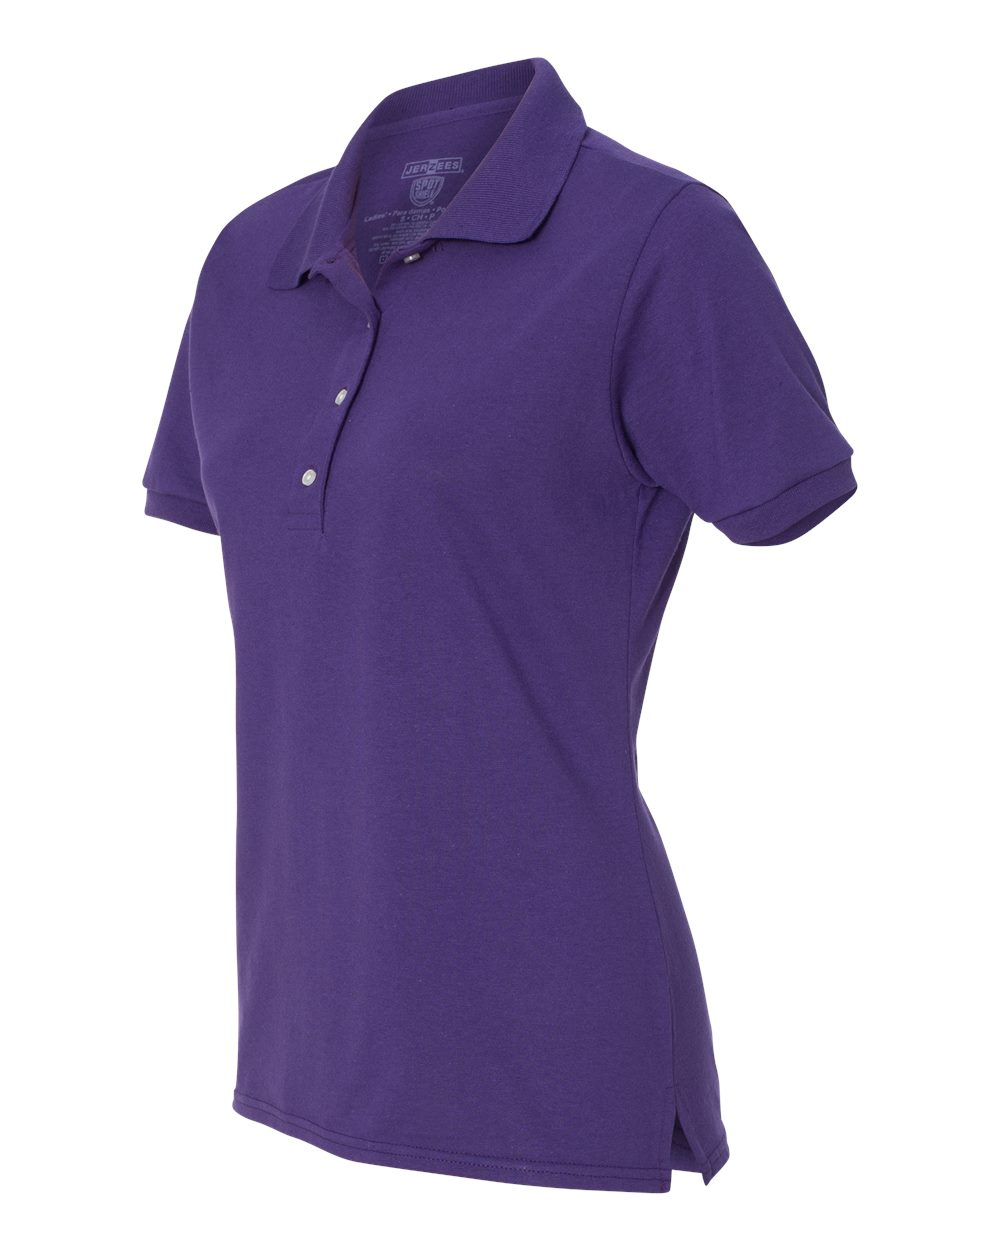 Jerzees-Women-039-s-5-6-oz-50-50-Jersey-Polo-with-SpotShield-437W-S-2XL thumbnail 18